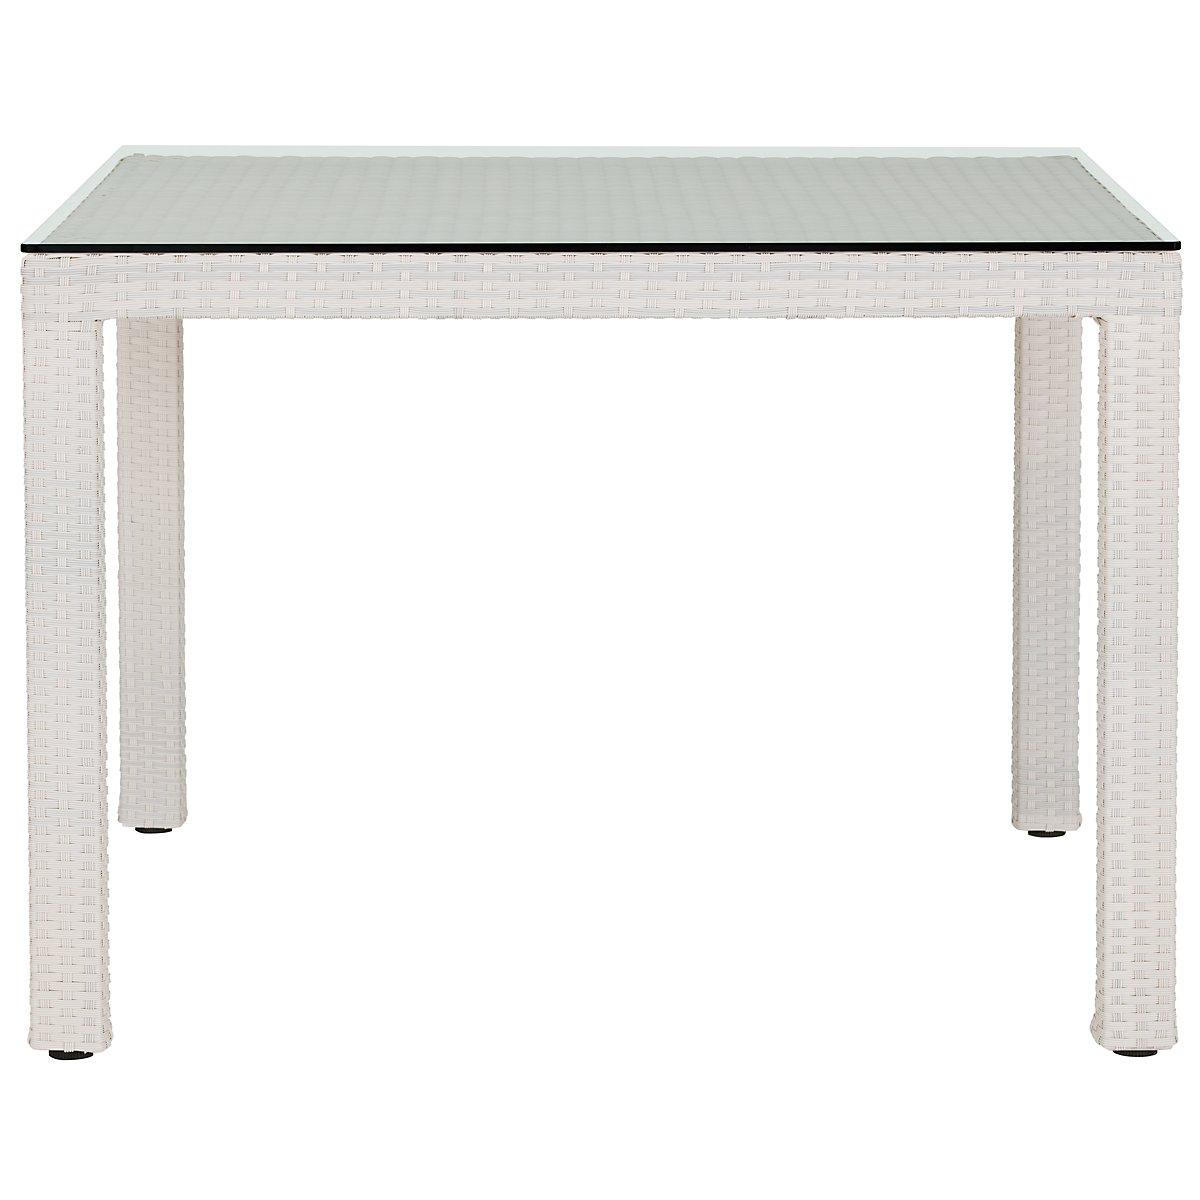 City furniture bahia white 40 square table